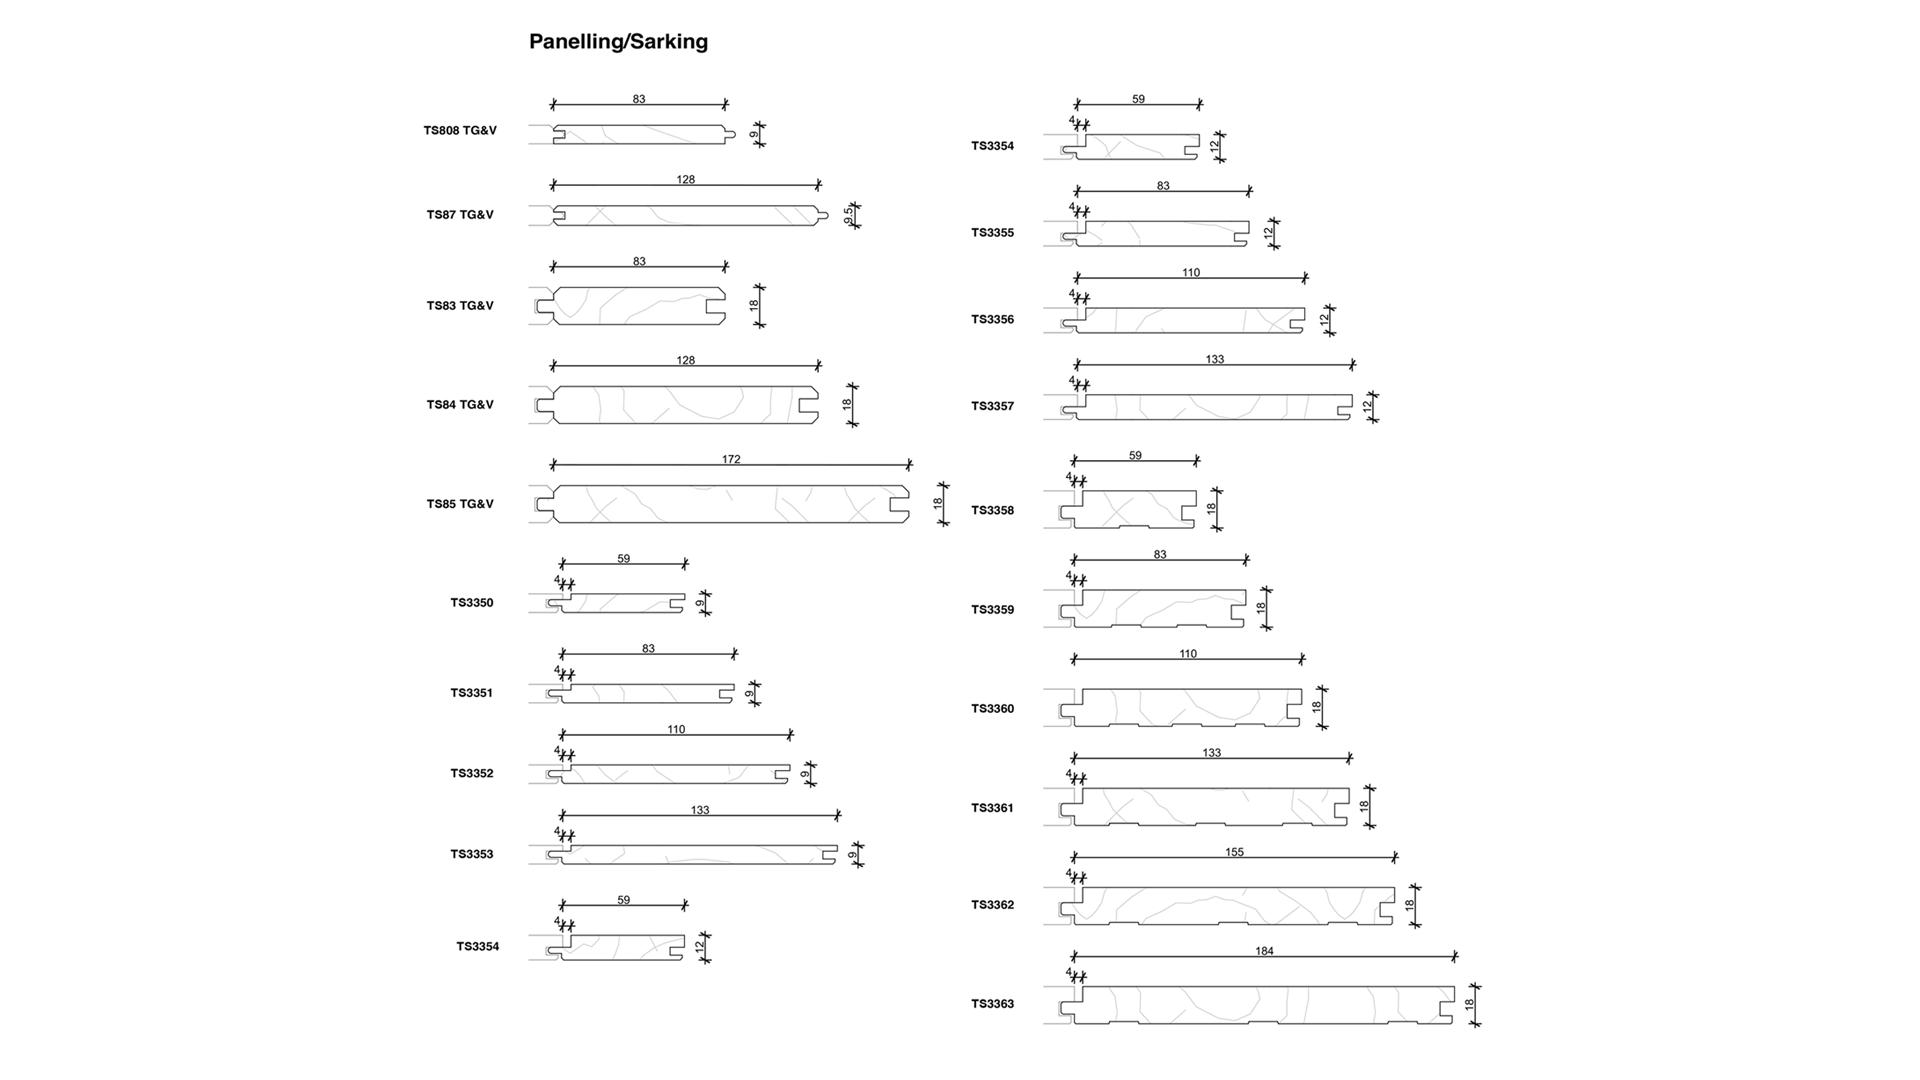 TS-Profiles_panelling-sarking